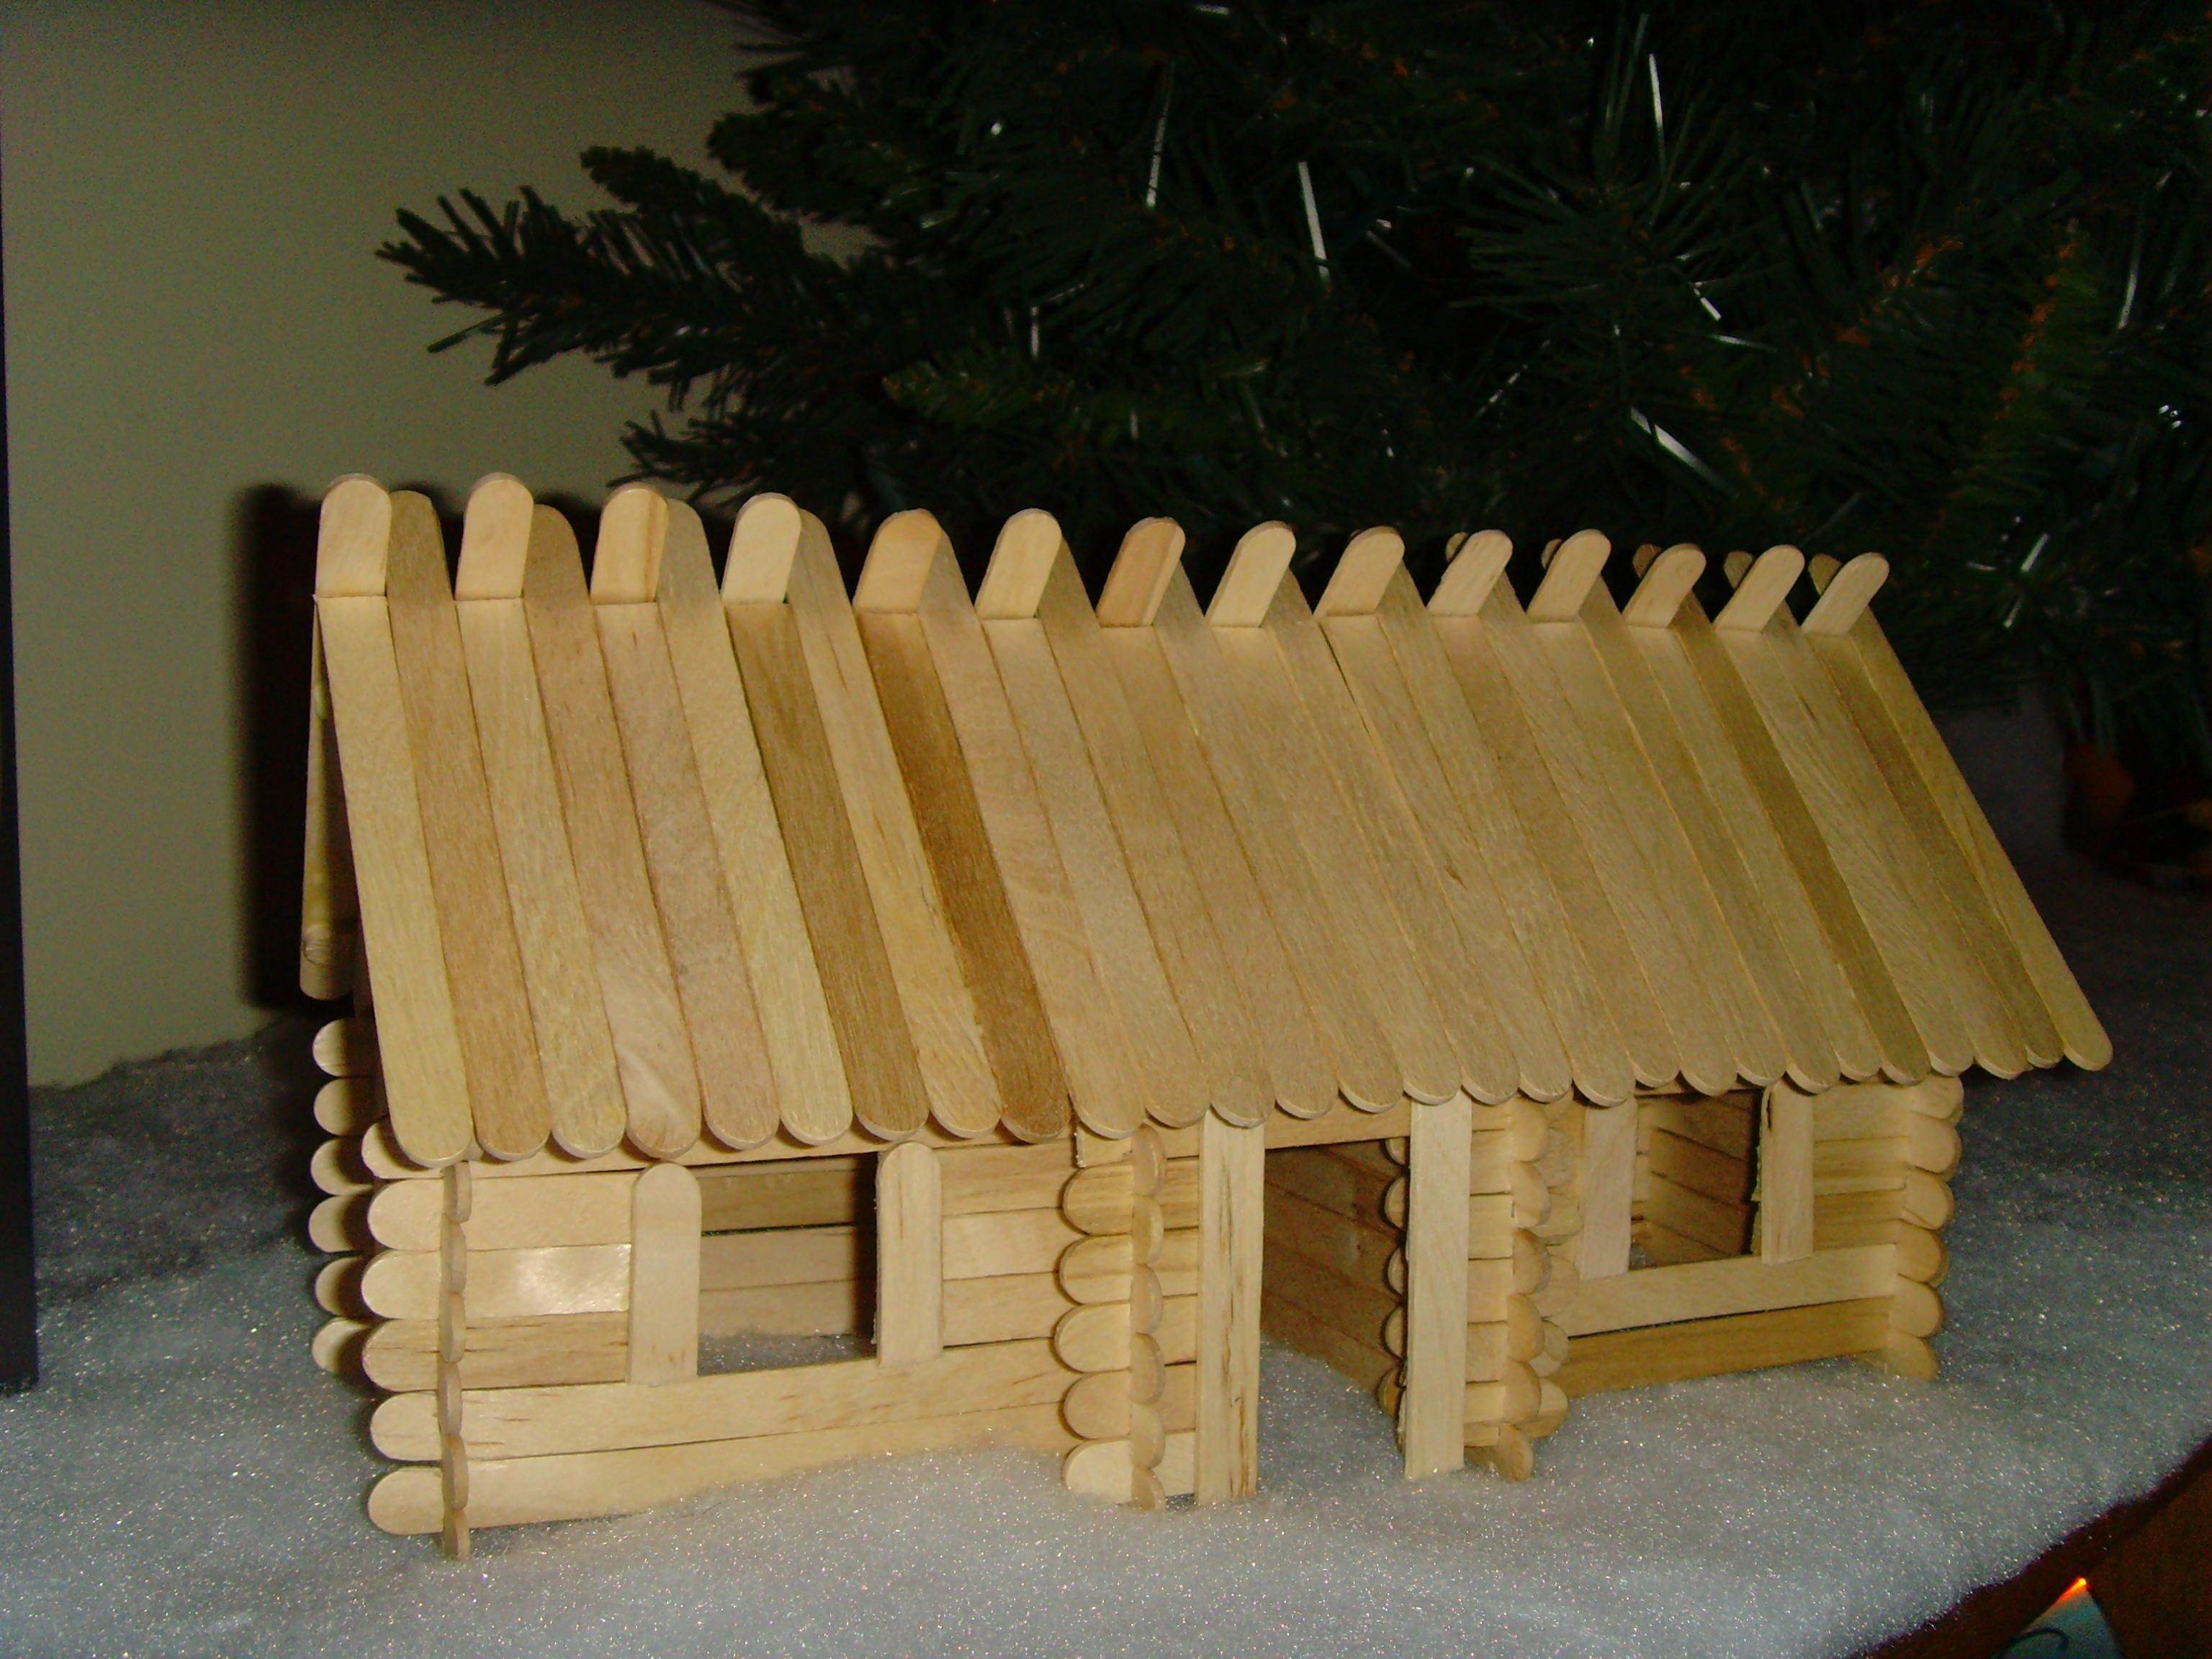 Craft Stick Log Cabin